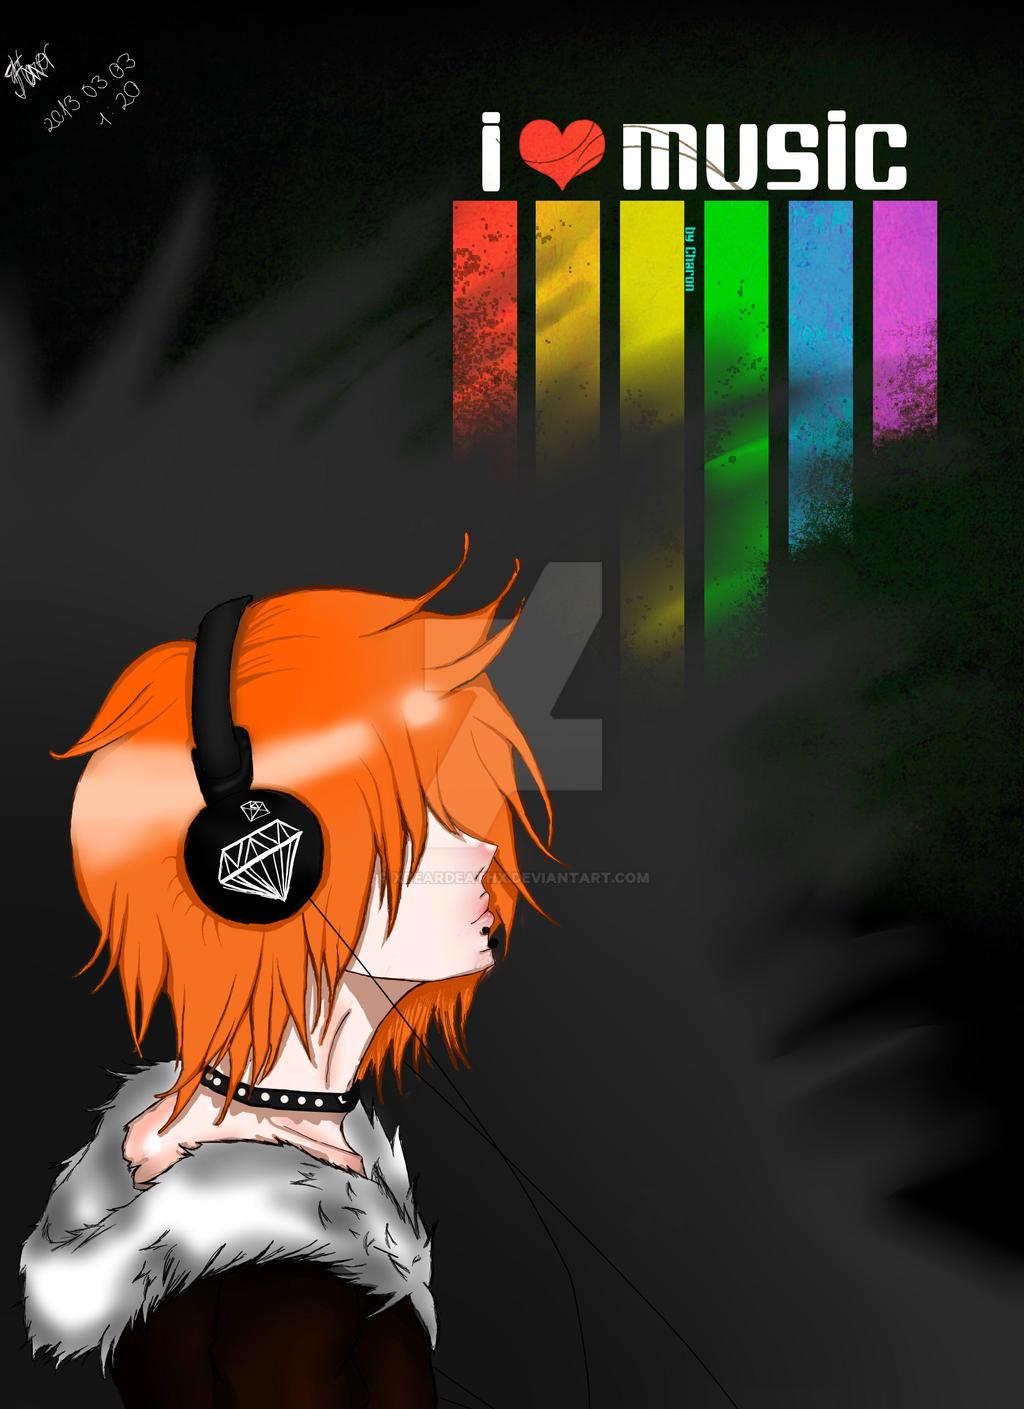 Anime boy by xDearDeathx